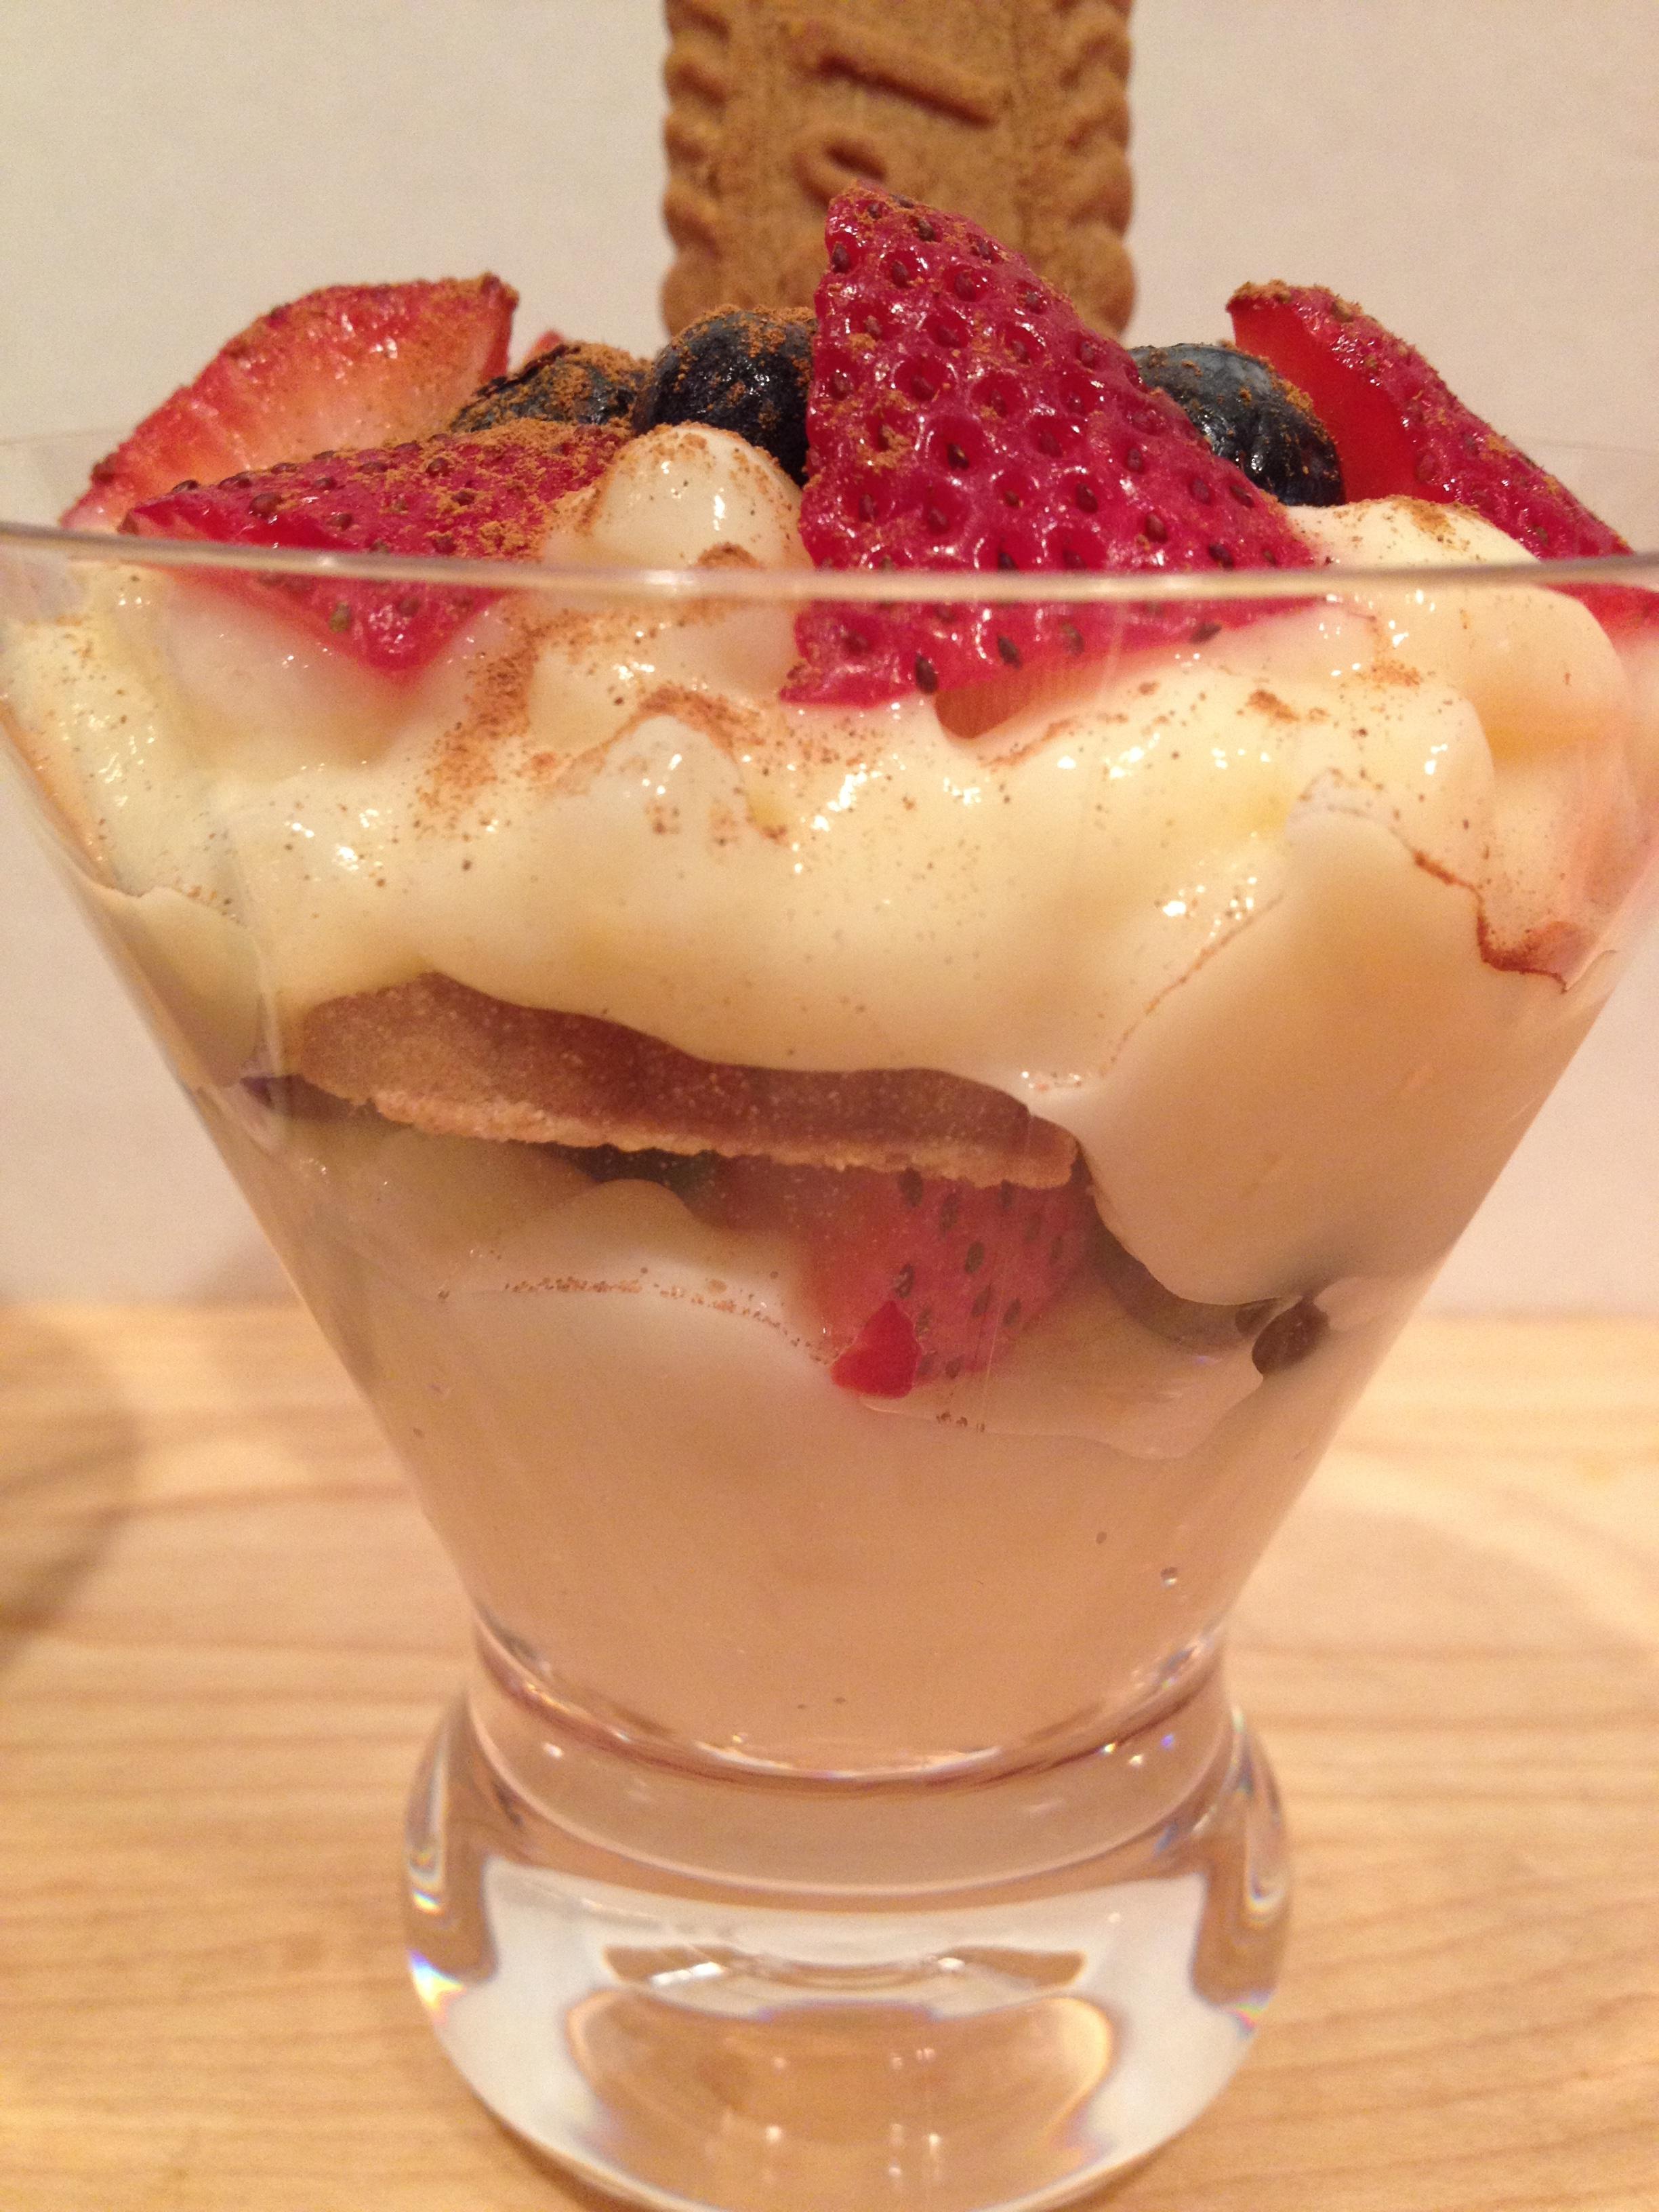 Inspiring Kitchen tapoica pudding parfait